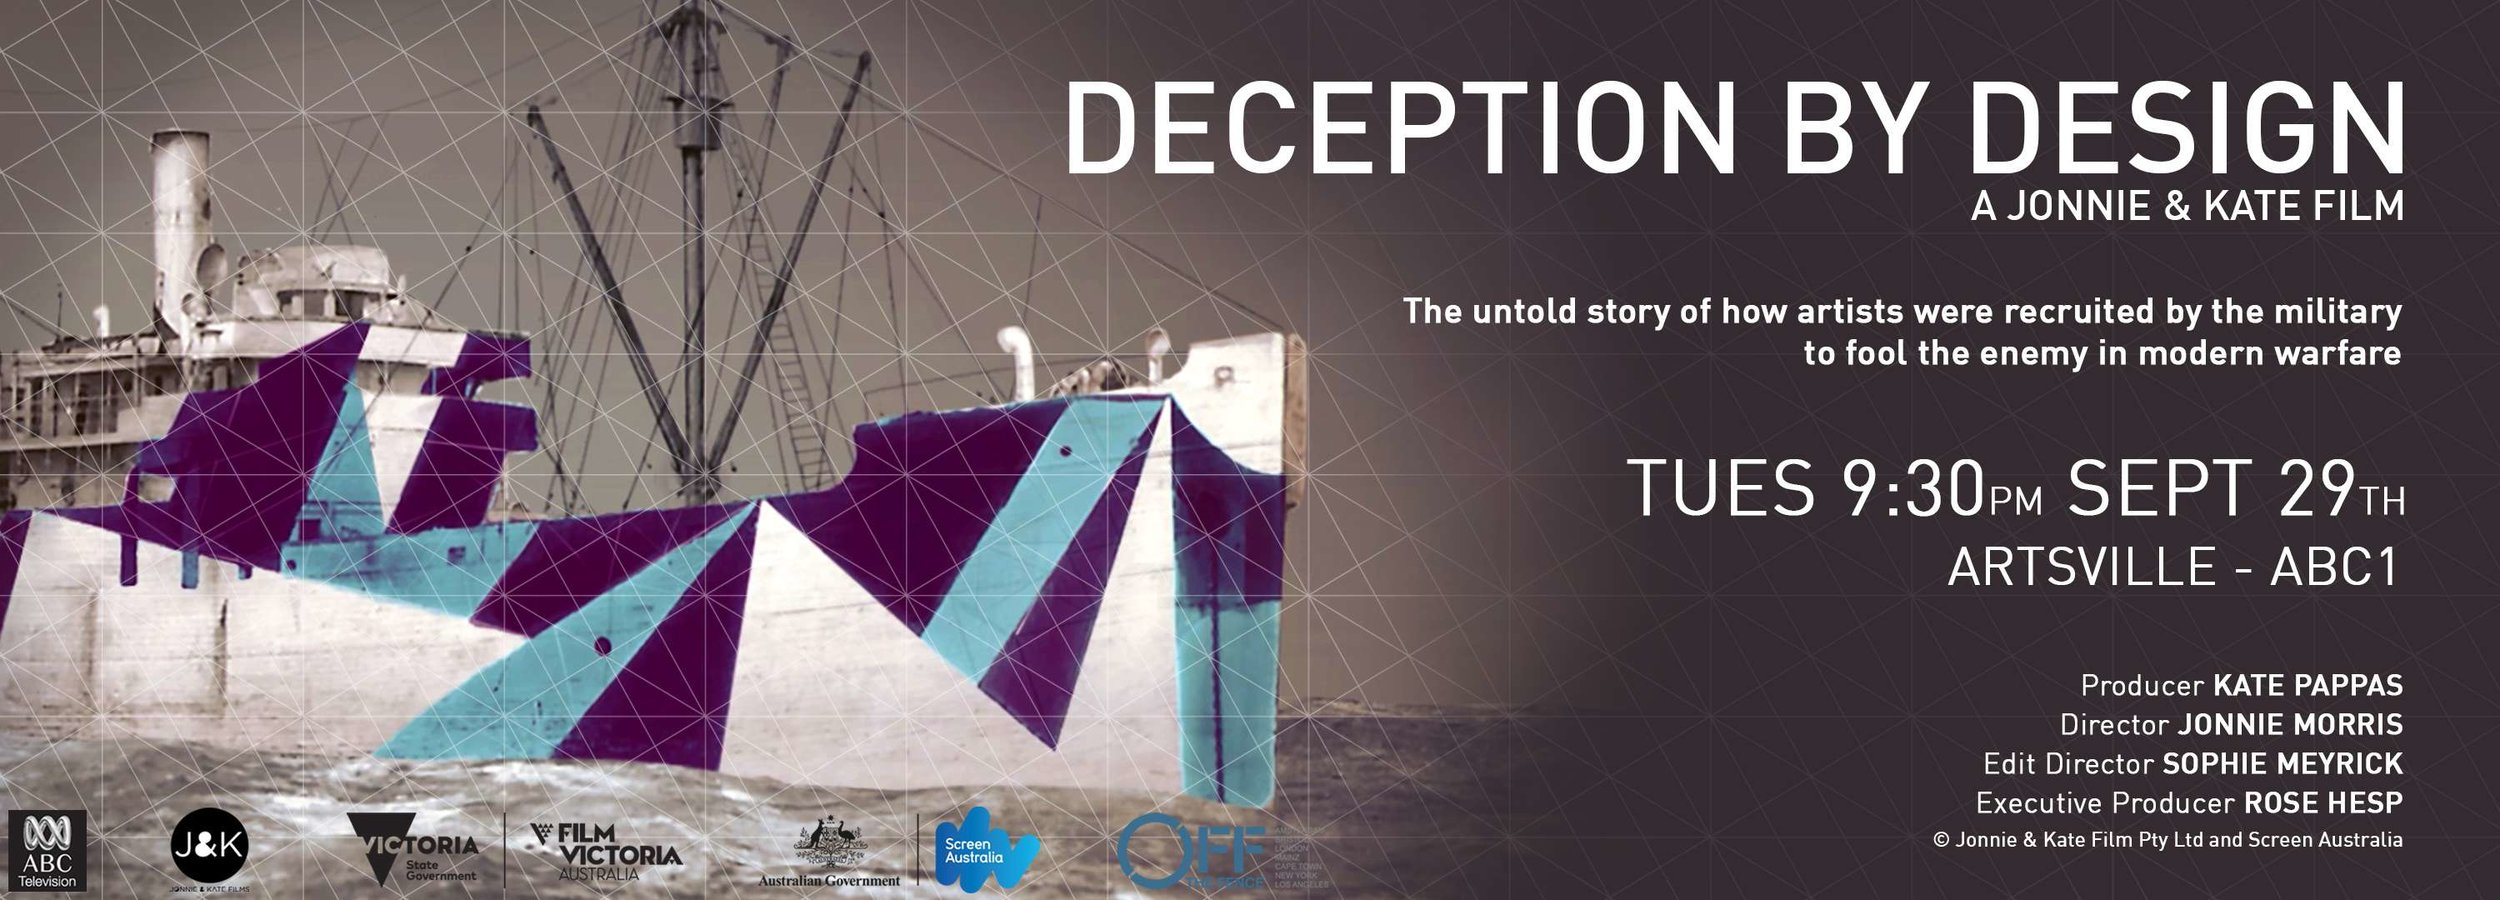 deception by design - abc tv